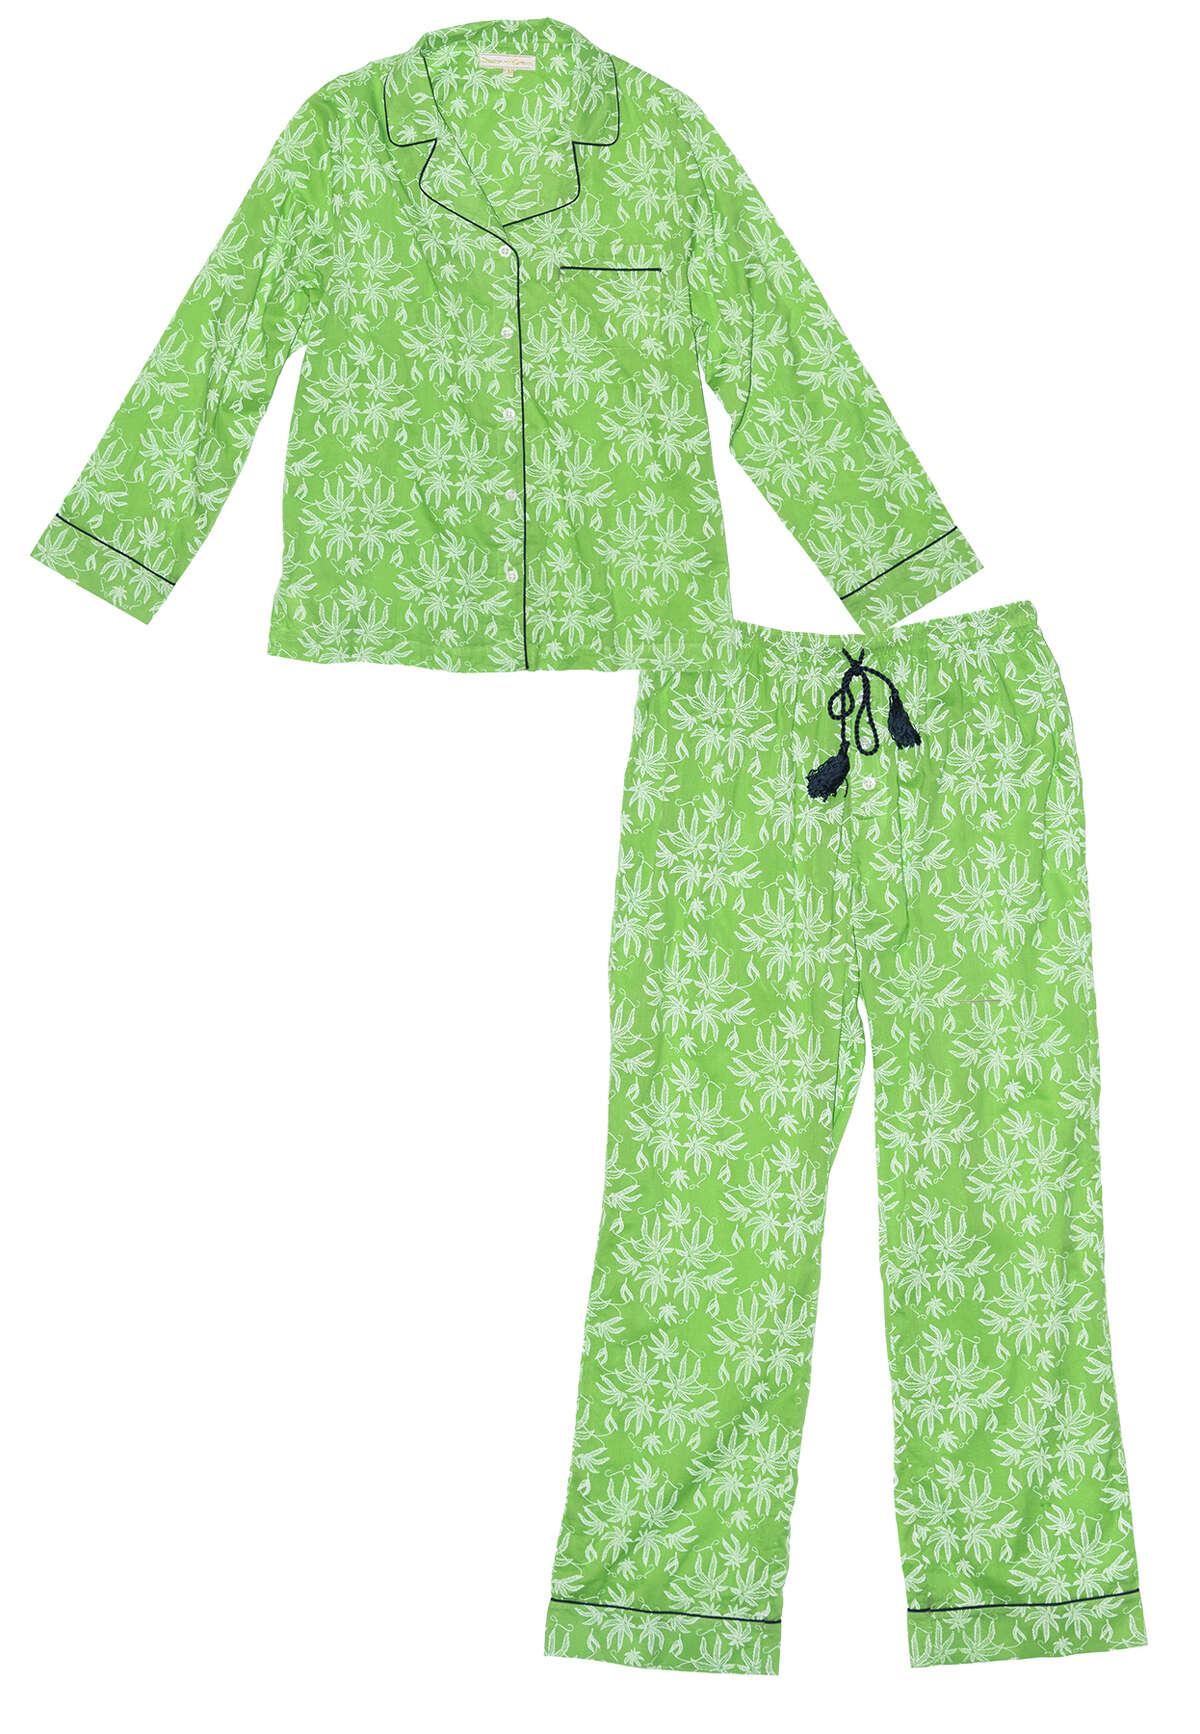 Texas-based Dawson & Hellmann 100 percent cotton voile Pot Toile print womenÂ?'s pajamas; $160 at Kuhl-Linscomb